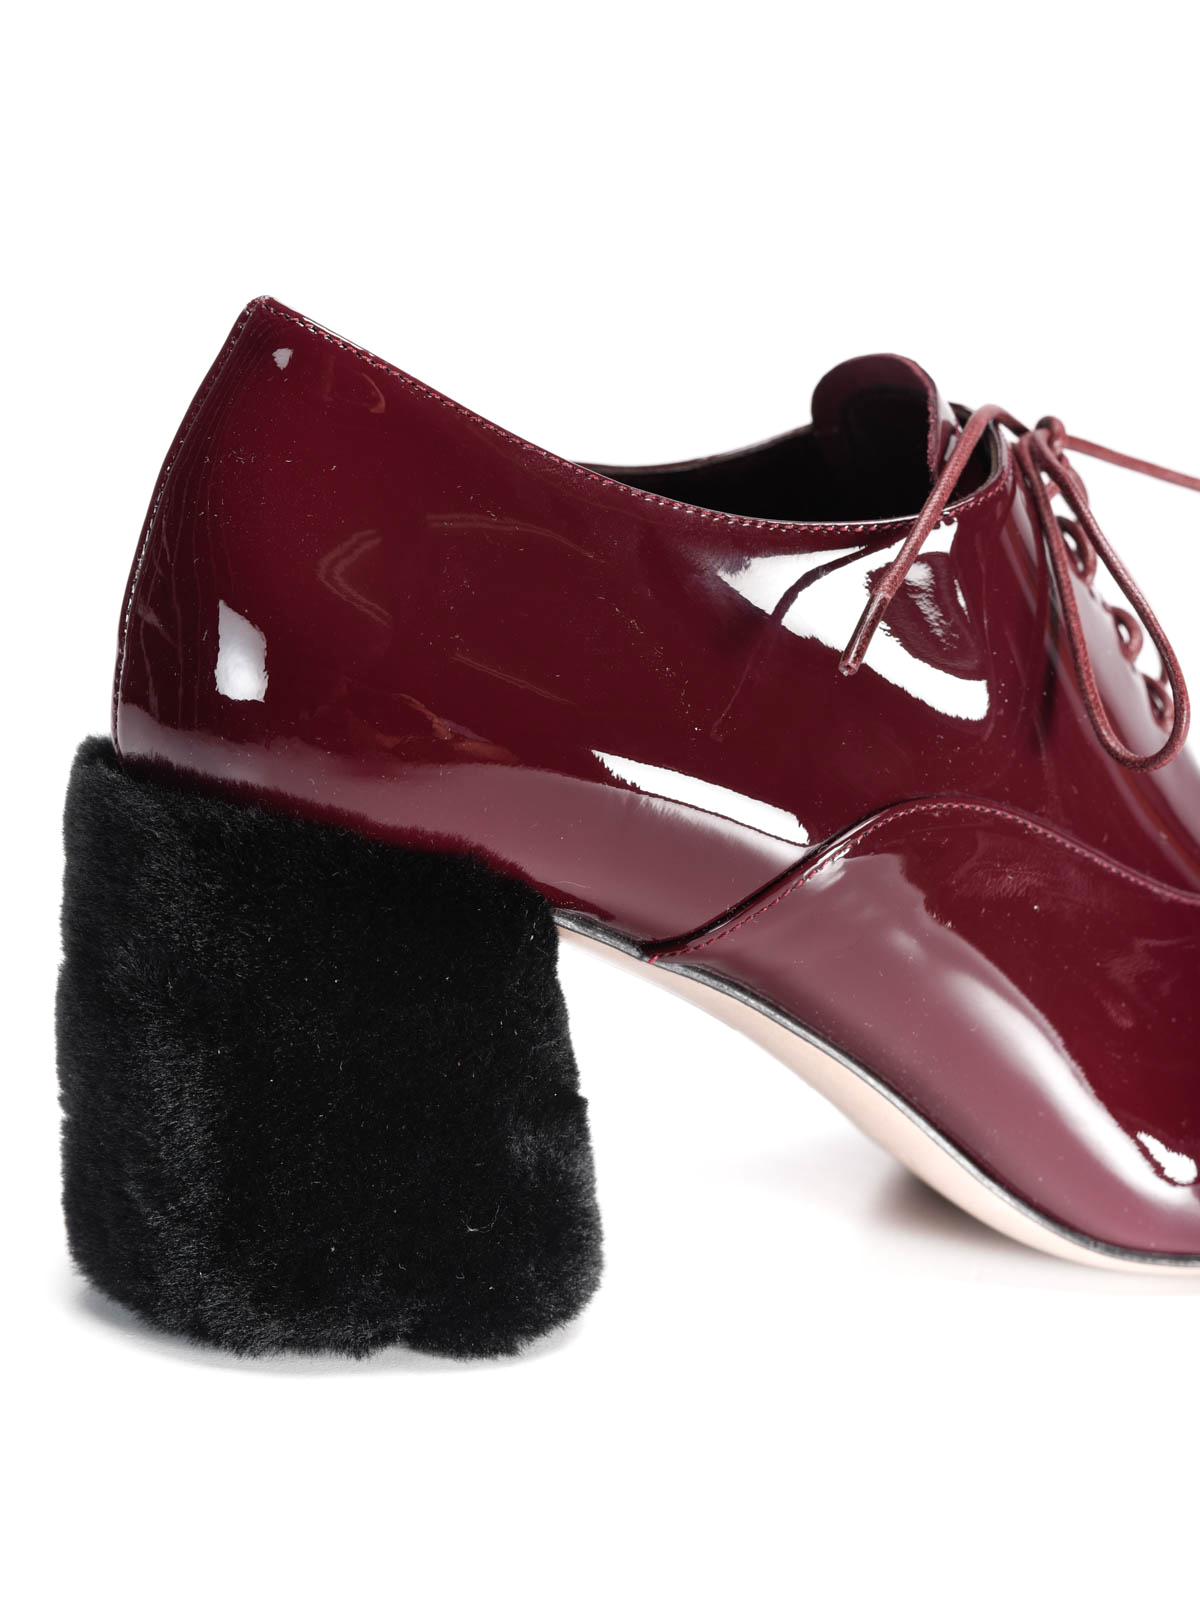 45ef98c8be9 Miu Miu - Fur detailed patent leather shoes - lace-ups shoes ...